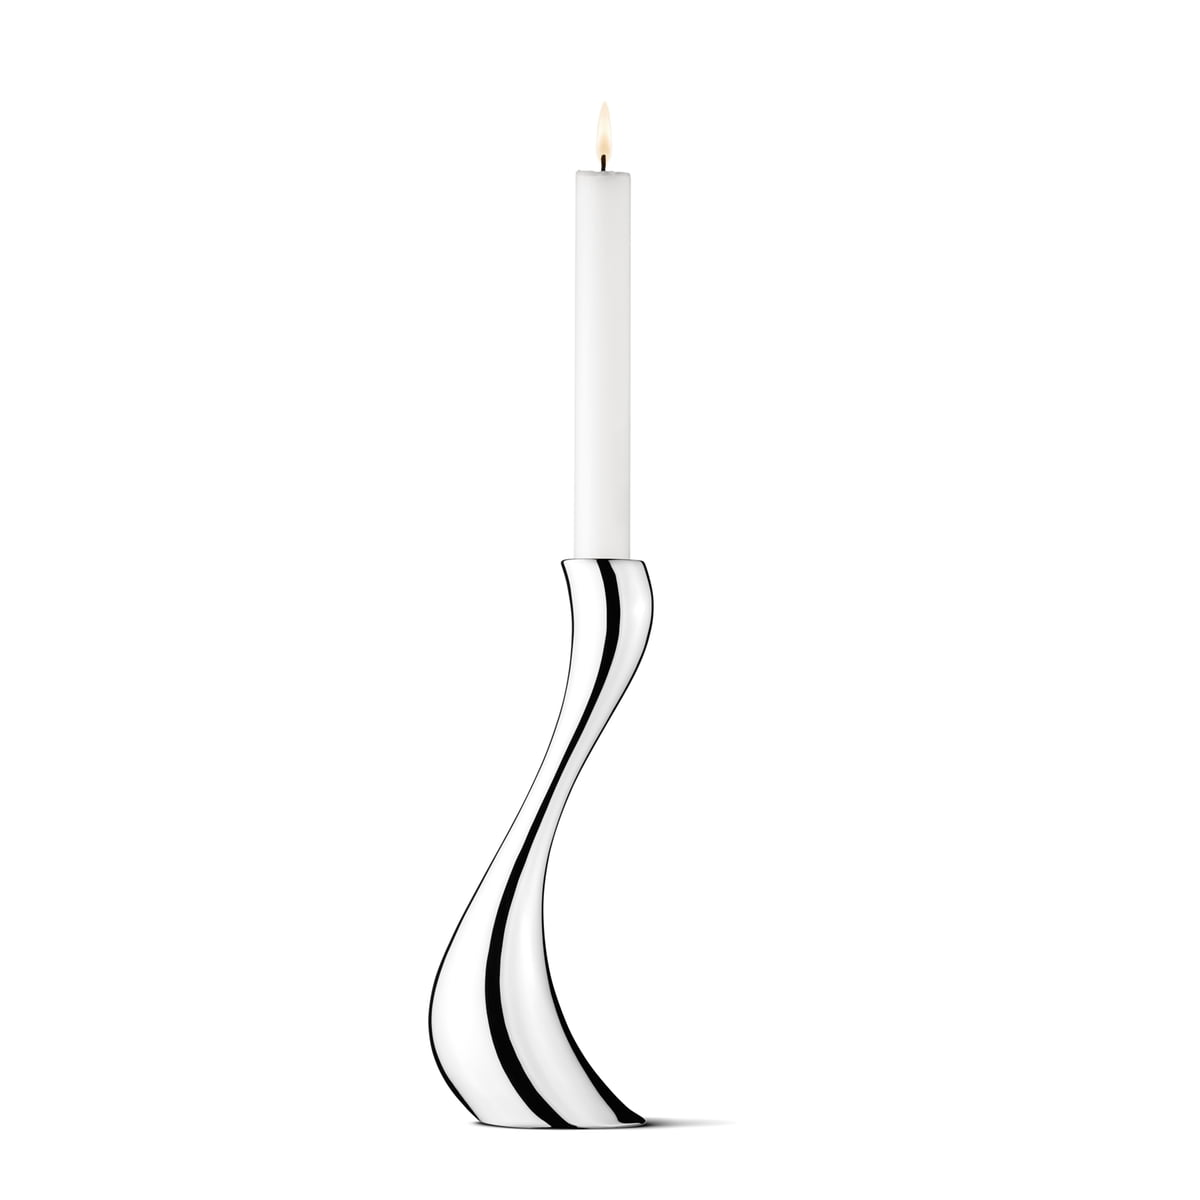 Georg Jensen - Cobra Kerzenleuchter, 24 cm   Dekoration > Kerzen und Kerzenständer > Kerzenleuchter   Georg Jensen